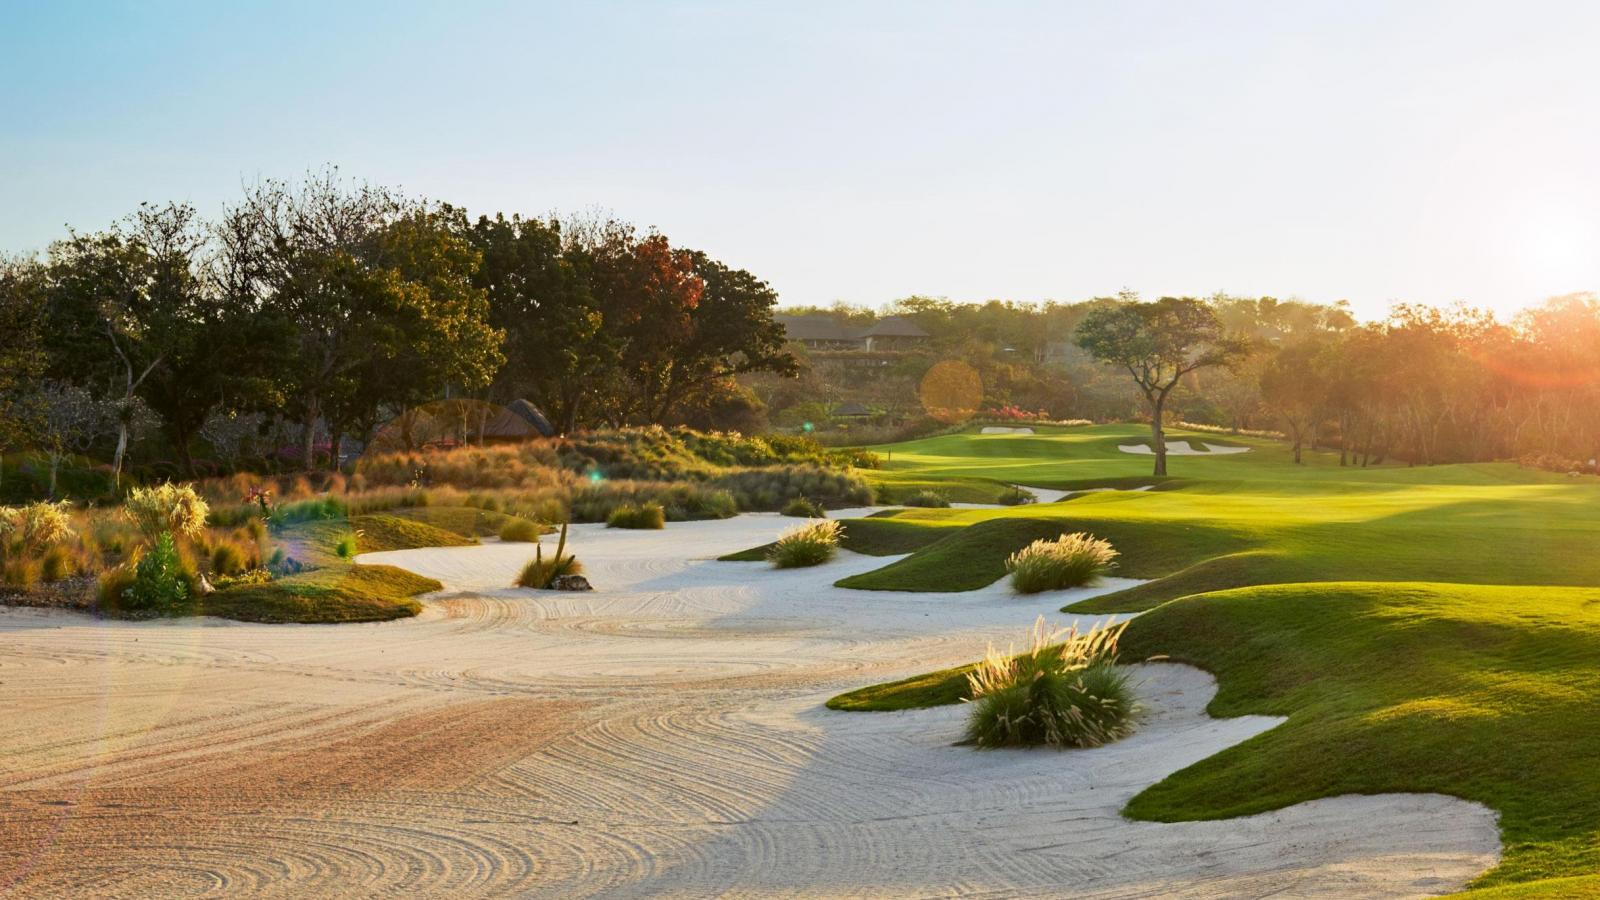 Bali National Golf Club Book Golf Online Golfscape